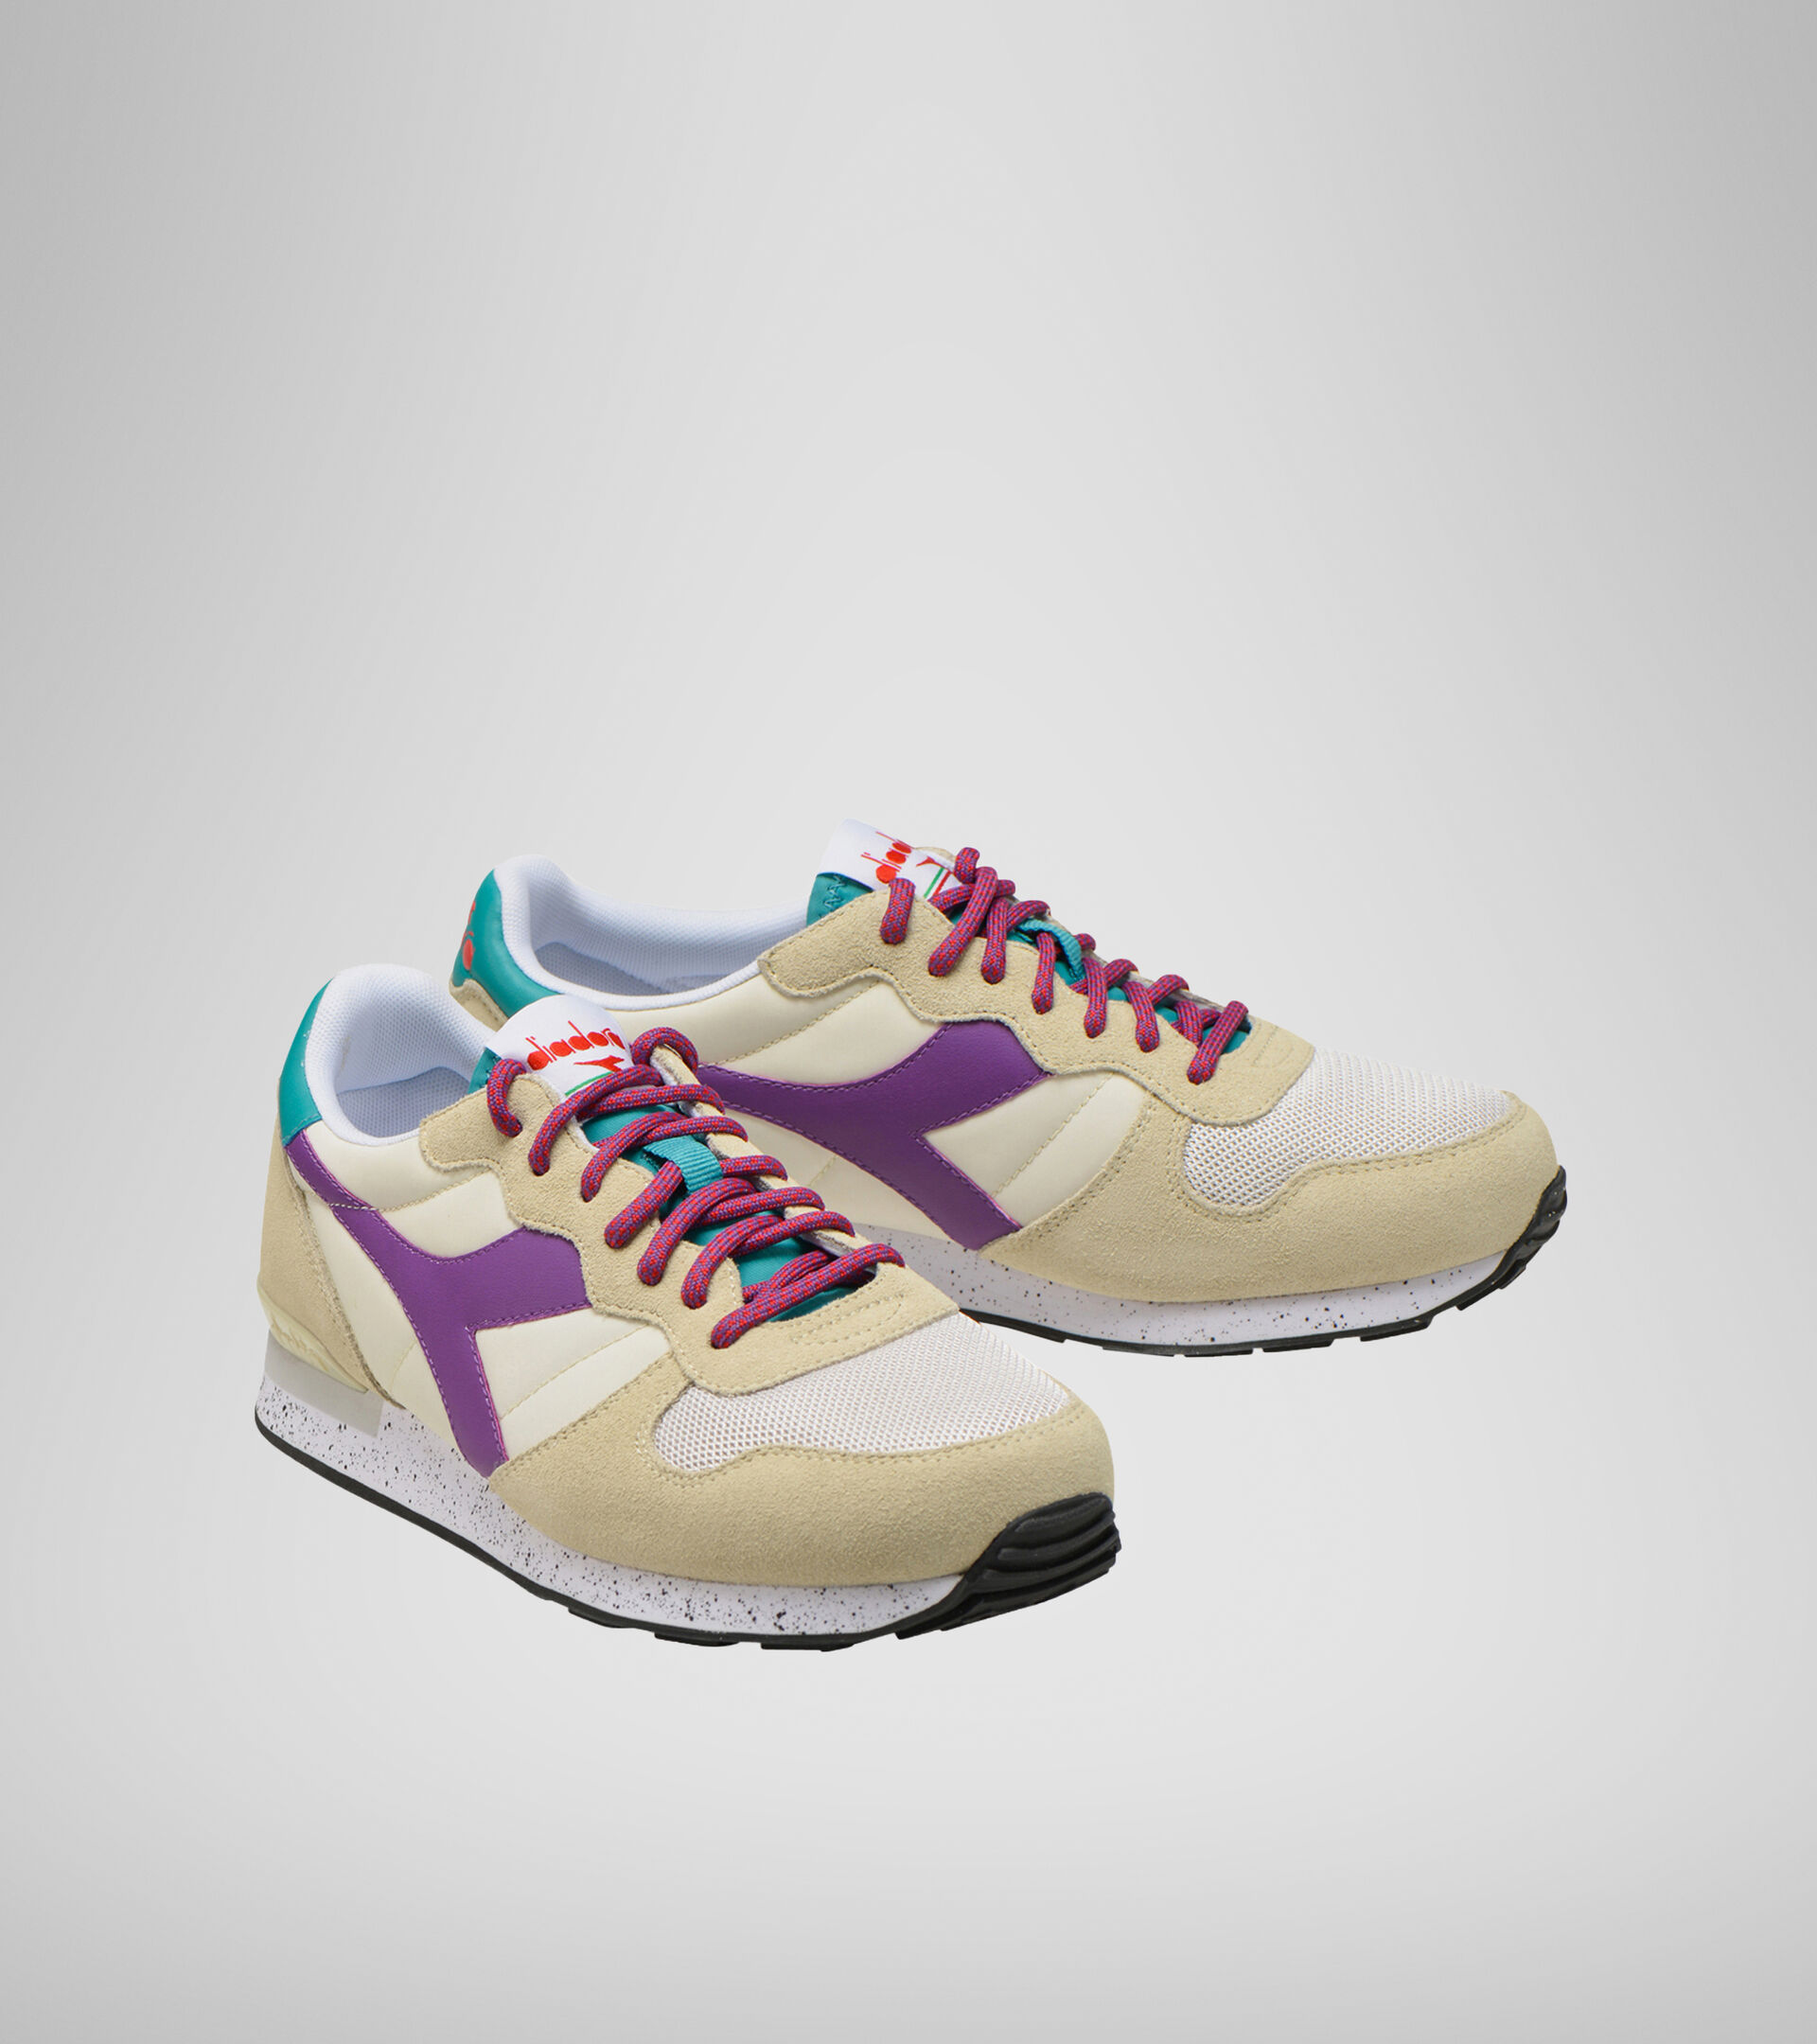 Footwear Sportswear UNISEX CAMARO OUTDOOR BEIGE OSTRICA Diadora